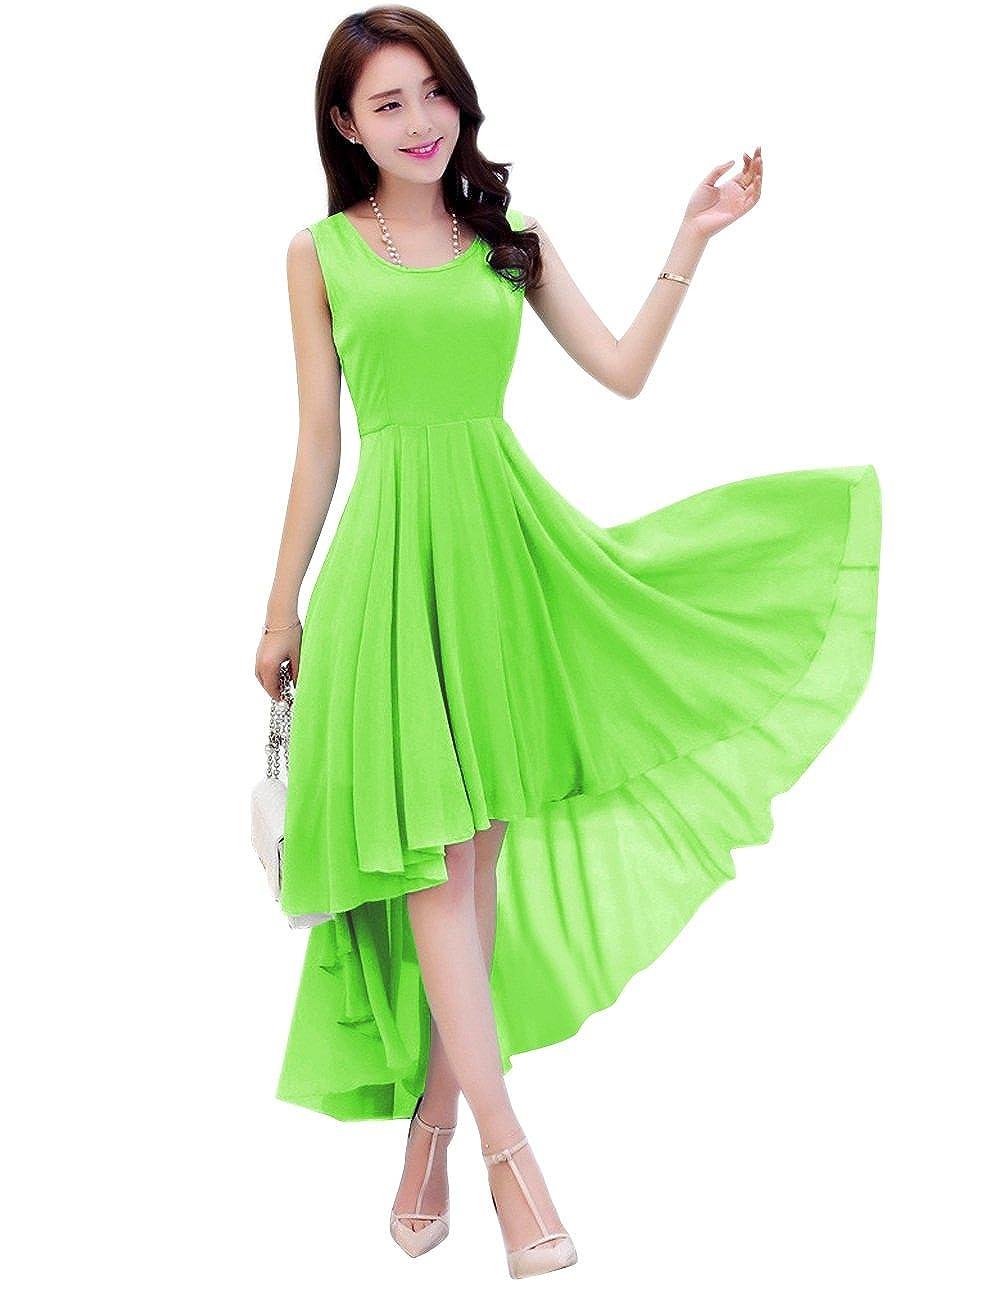 Lime Green Dasior Women's ALine Asymmetric High Low Summer Beach Holiday Party Dress